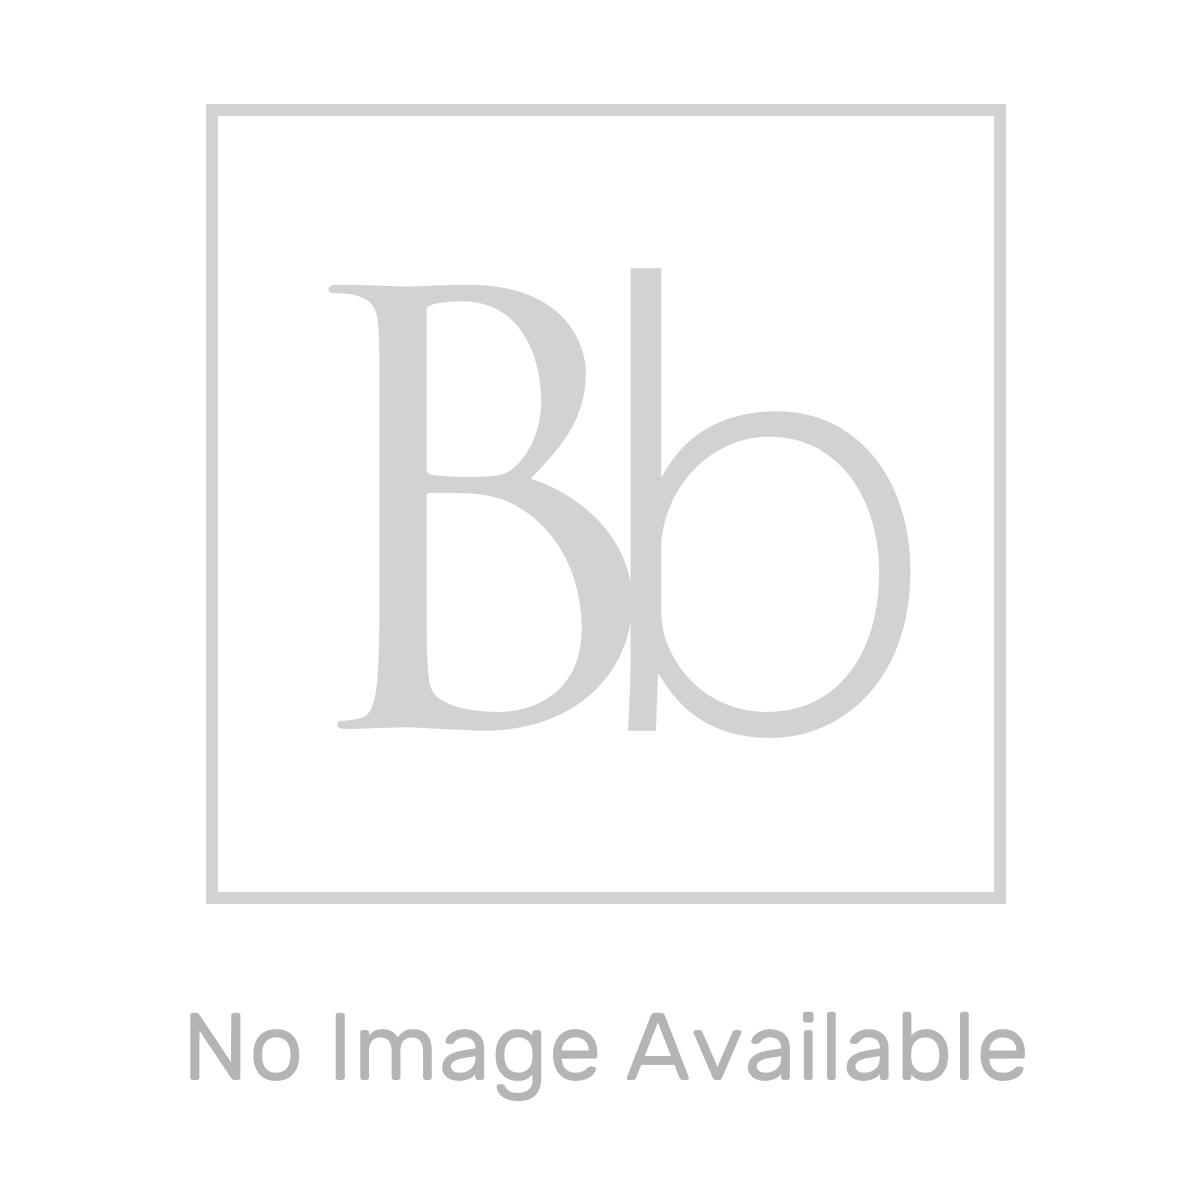 Aquadart Grey Slate Shower Tray 1600 x 800 Lifestyle